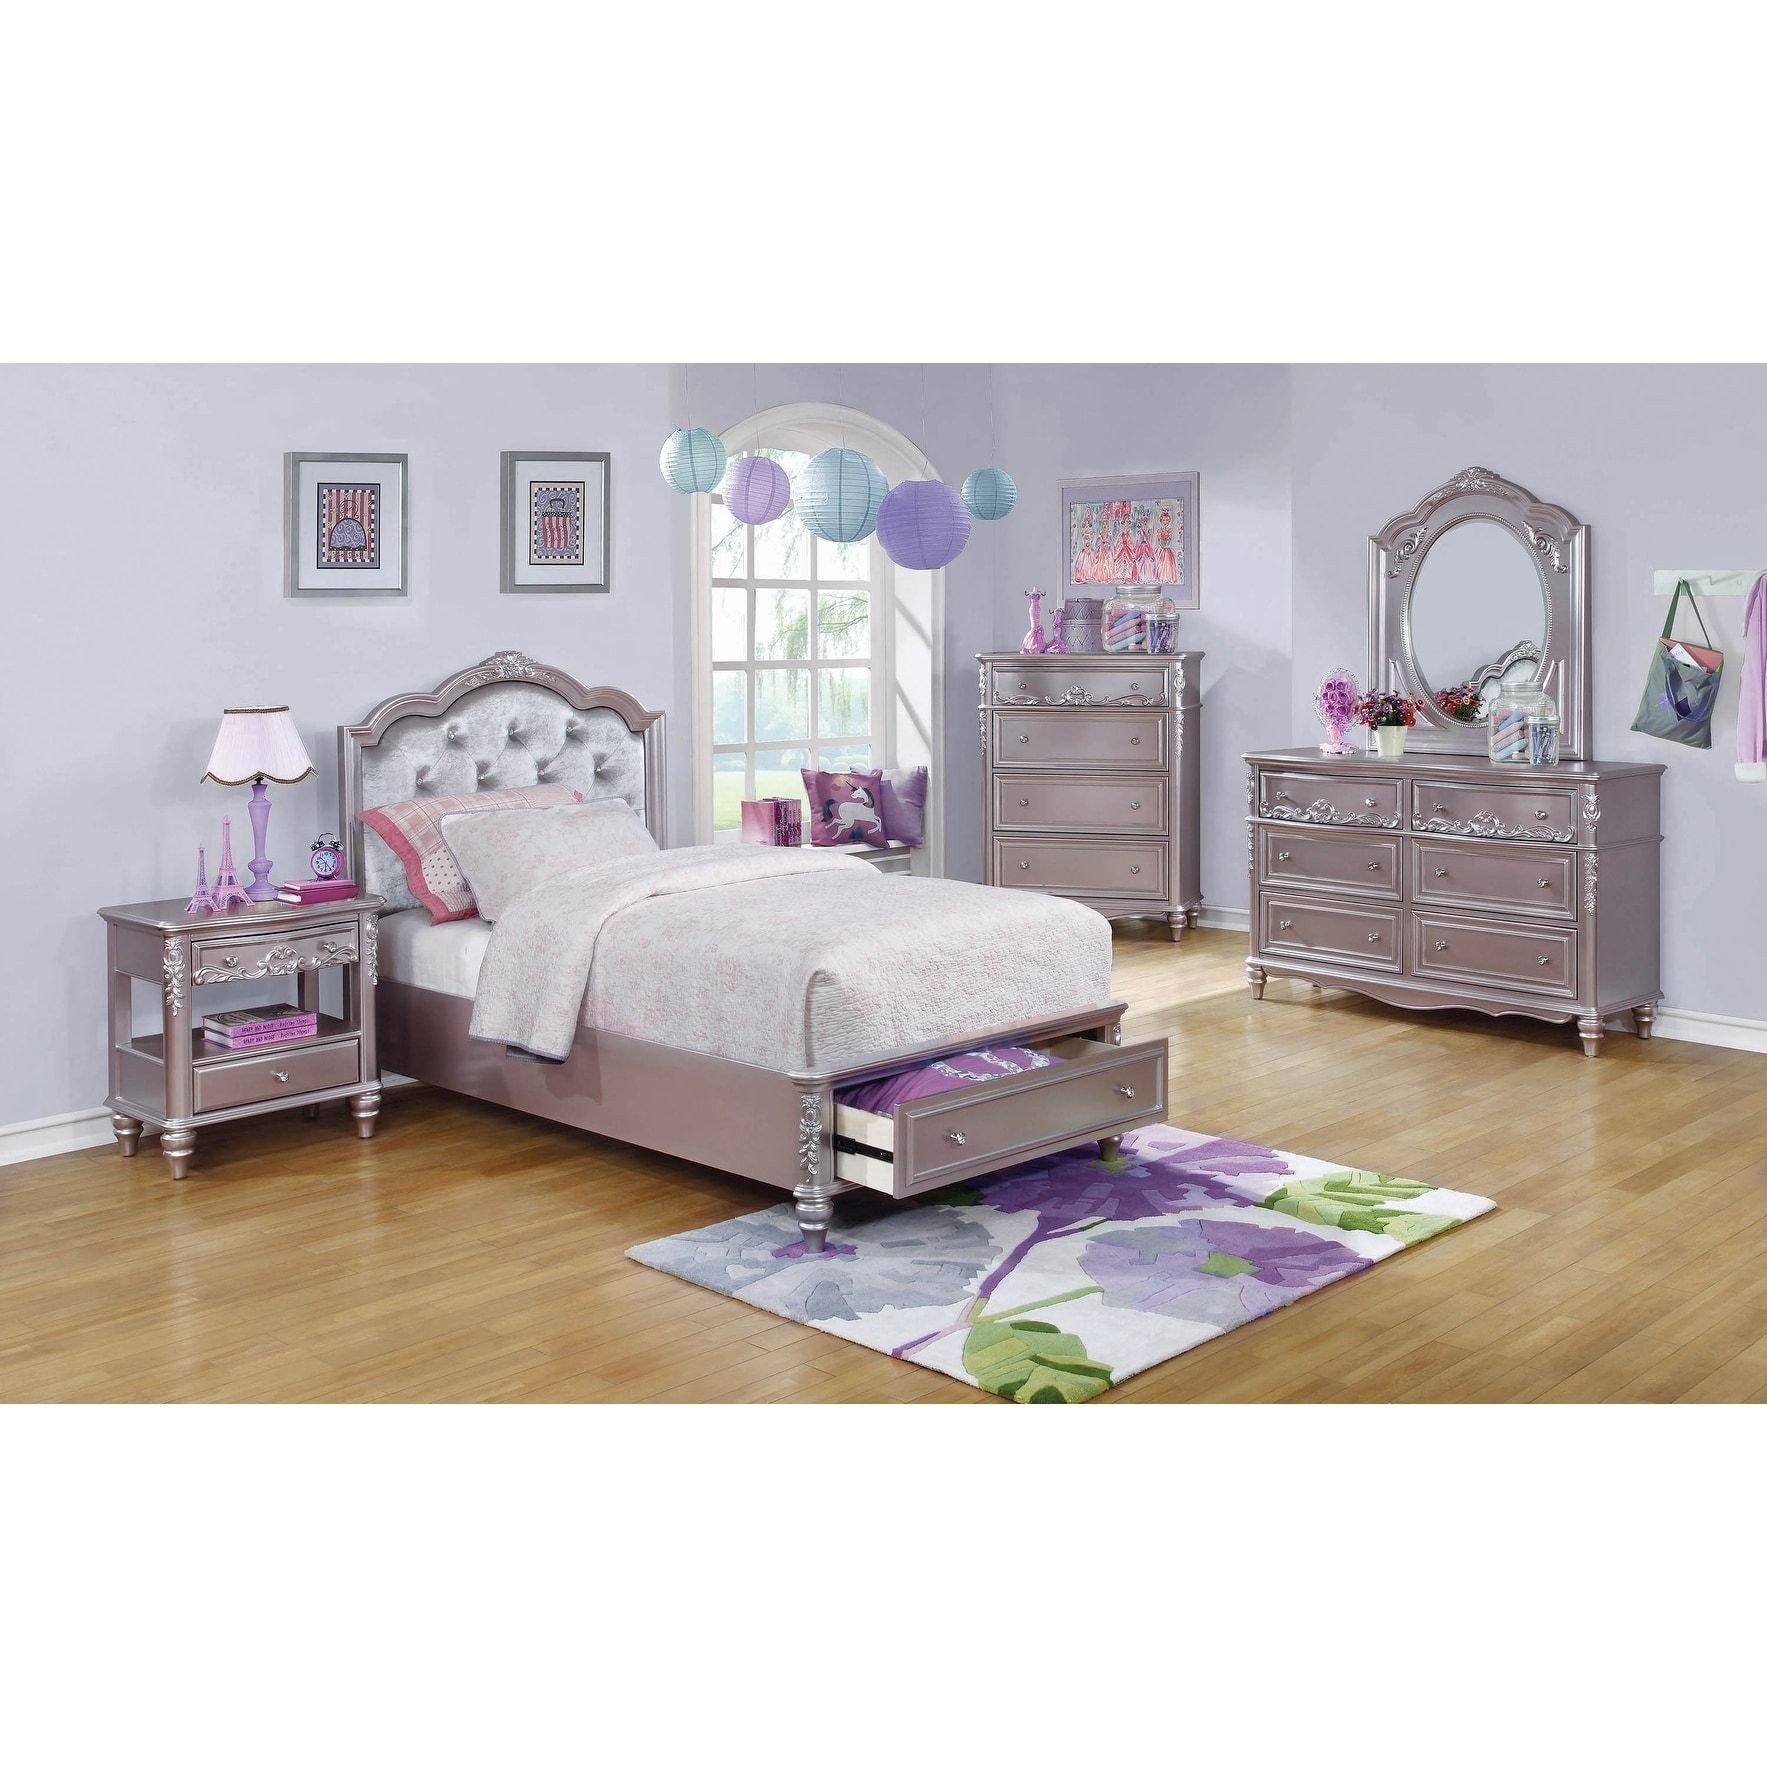 Sofia Vergara Bedroom Set New Seraphina Metallic Lilac 4 Piece Bedroom Set with 2